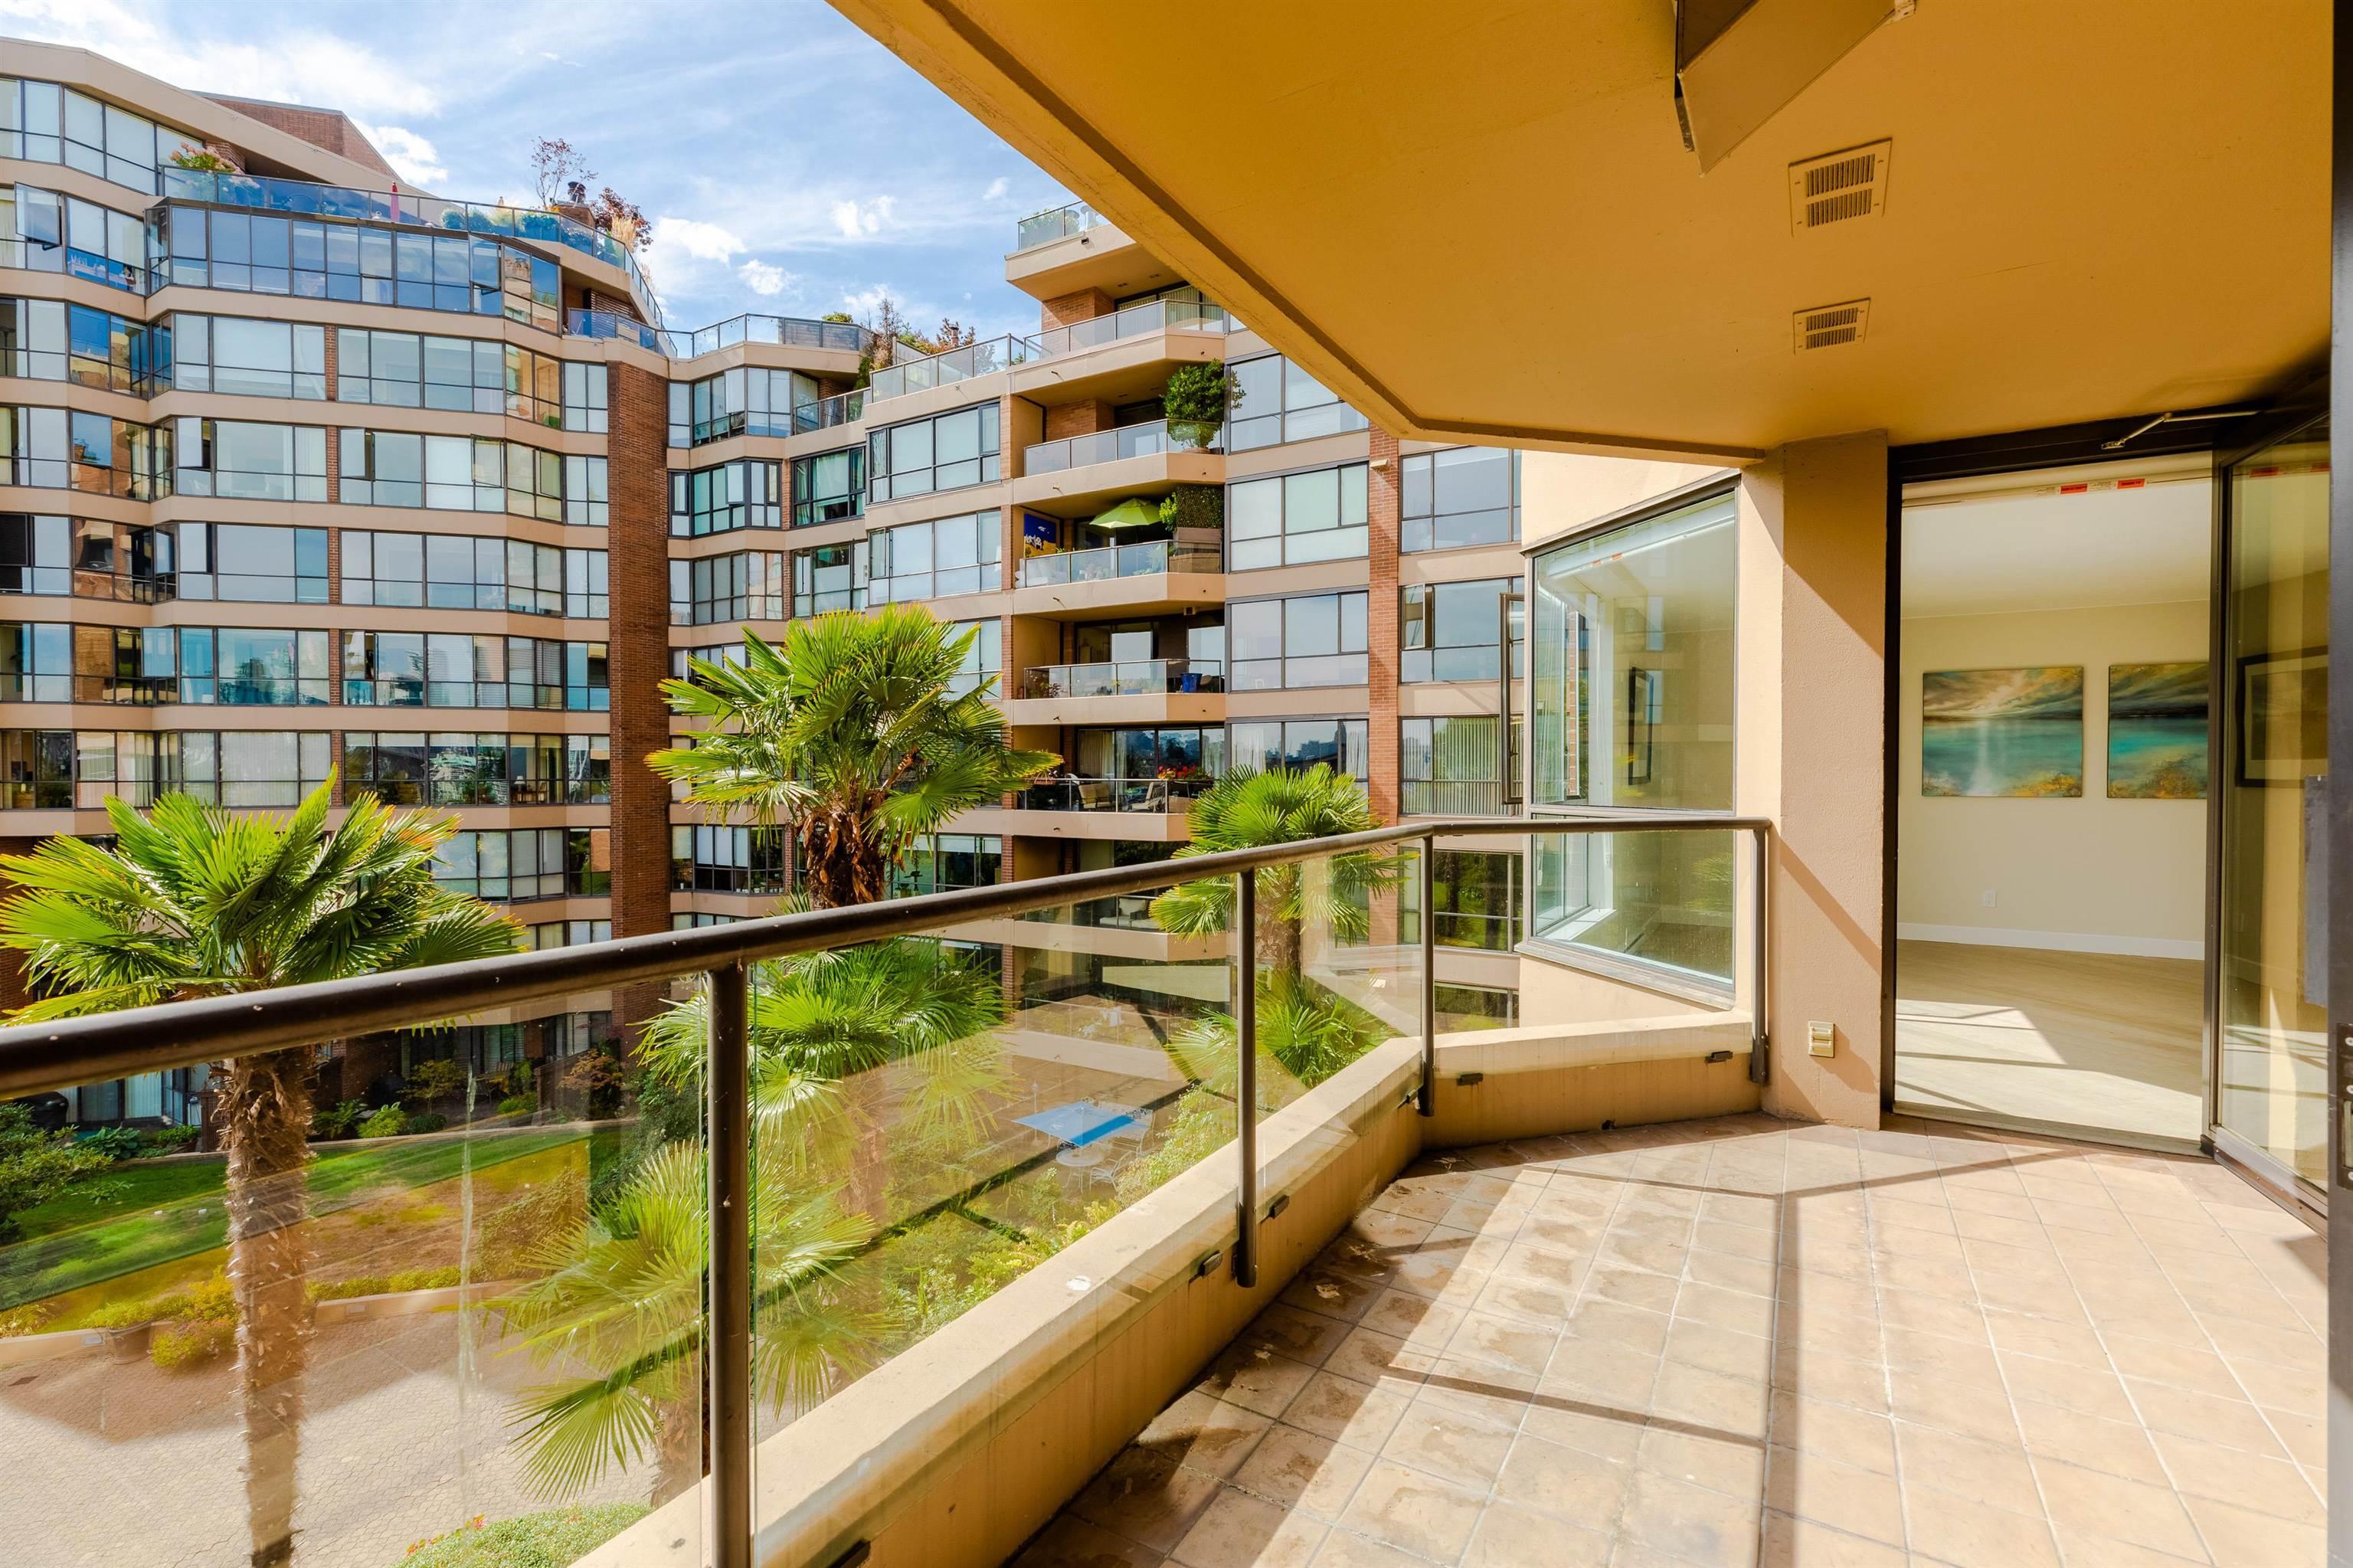 406 1450 PENNYFARTHING DRIVE - False Creek Apartment/Condo for sale, 2 Bedrooms (R2617259) - #37